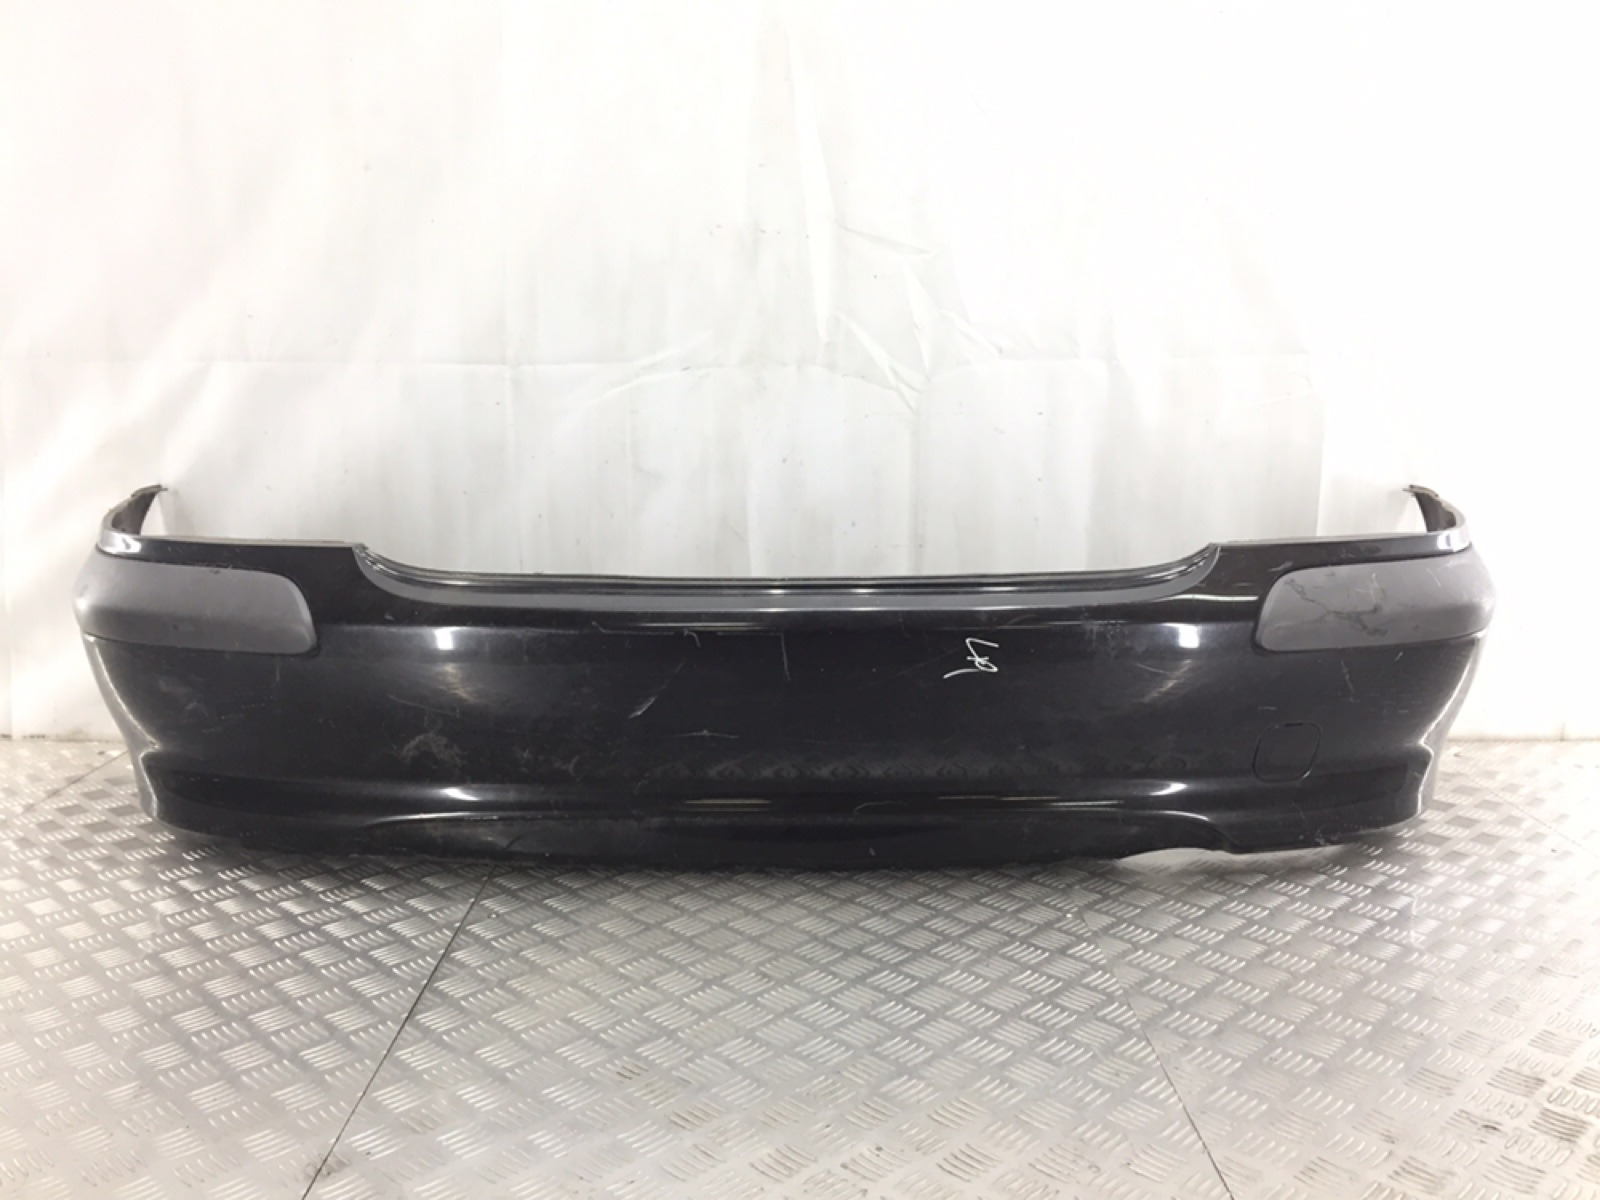 Бампер задний Nissan Almera N16 1.8 I 2002 (б/у)